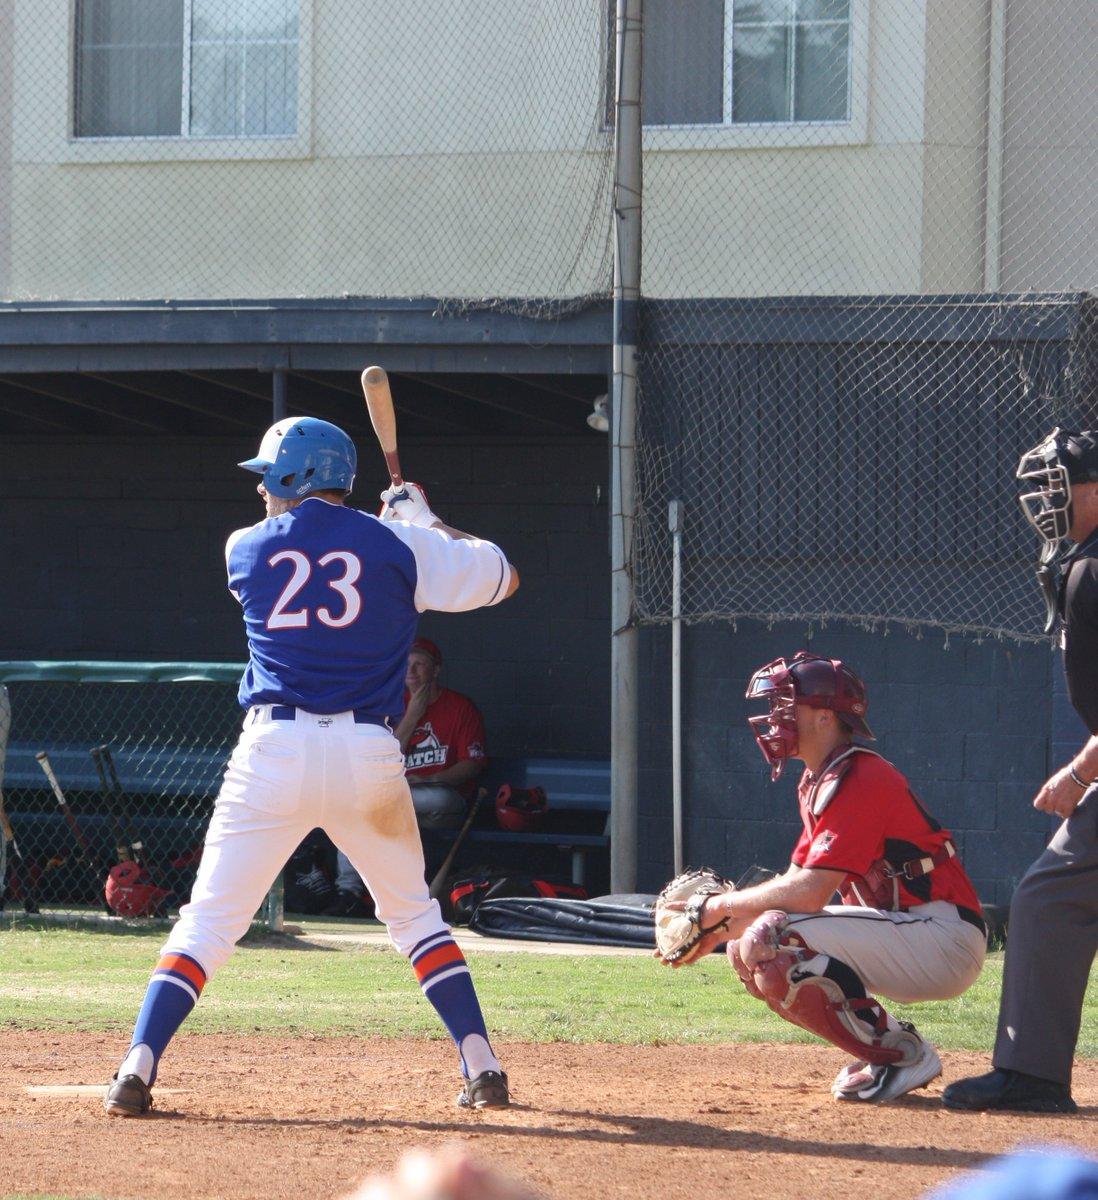 OC Riptide Baseball (@ocriptide)